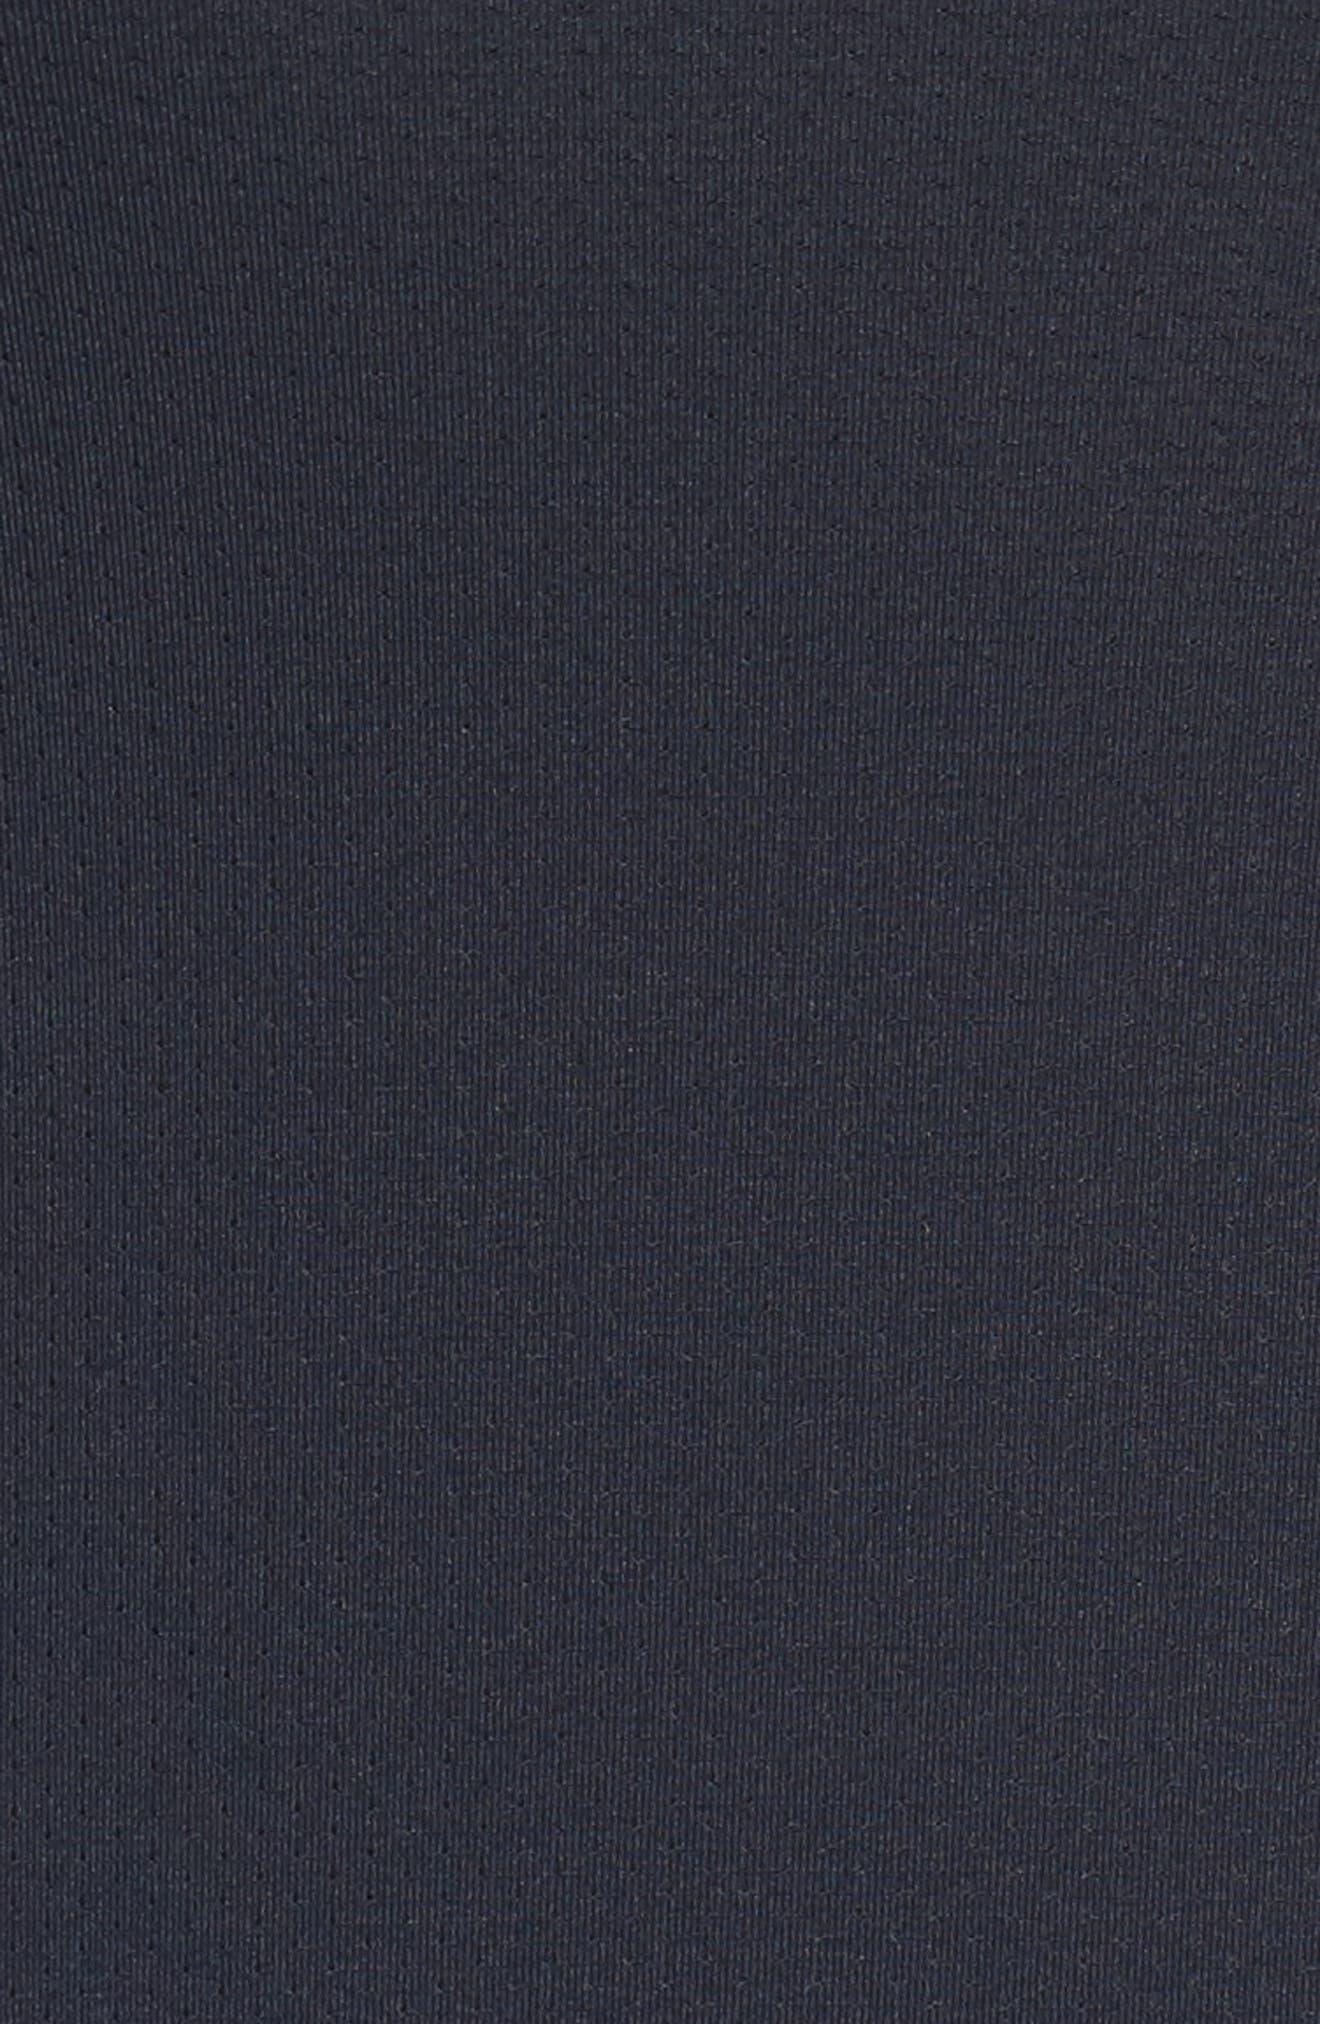 Training Pullover,                             Alternate thumbnail 6, color,                             475